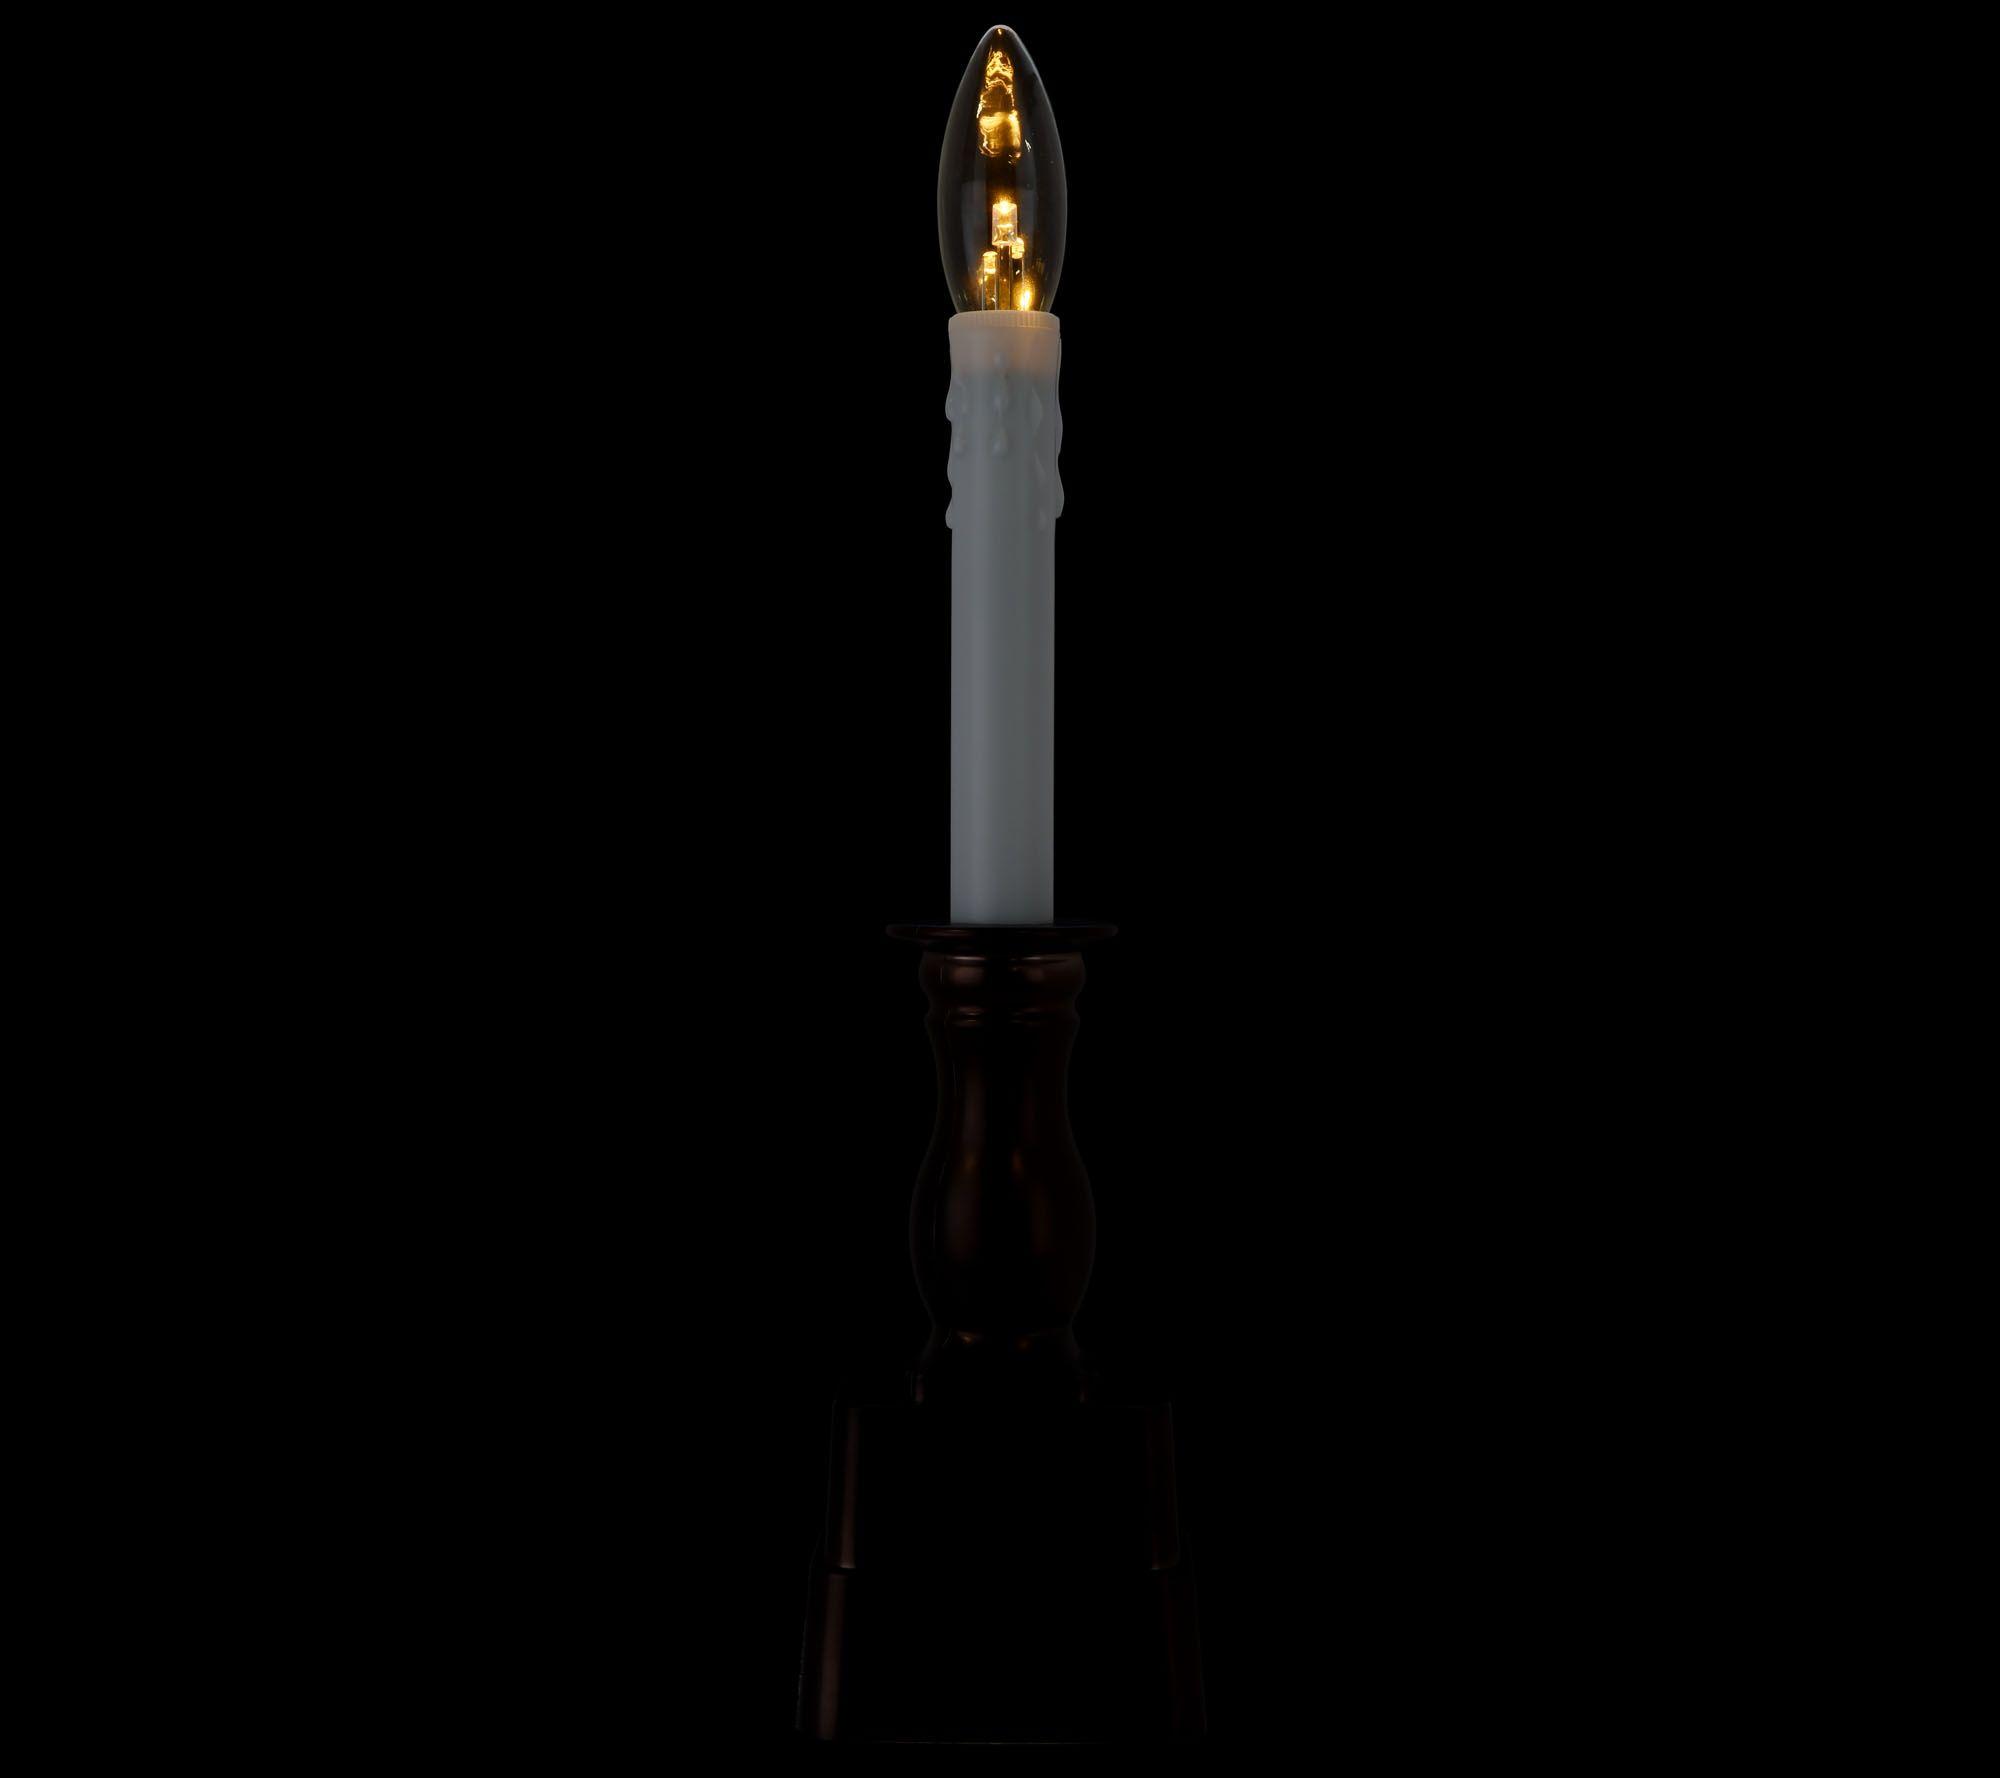 Bethlehem lights window candles with timer - Bethlehem Lights Set Of 4 Battery Op Slim Base Window Candles Page 1 Qvc Com